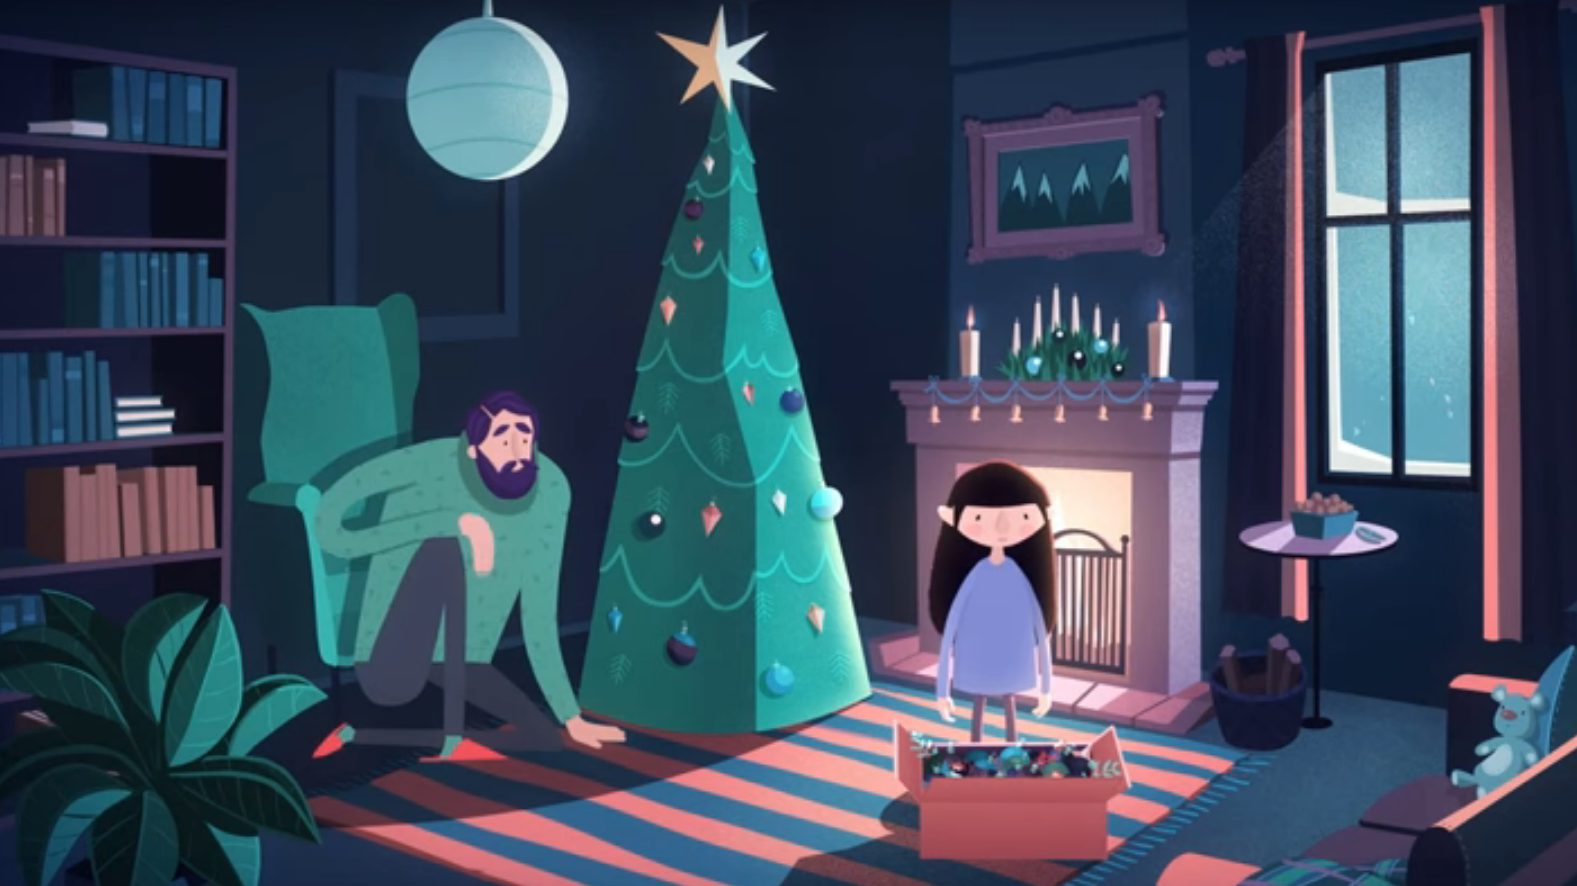 scena video: bambina con pacco regalo